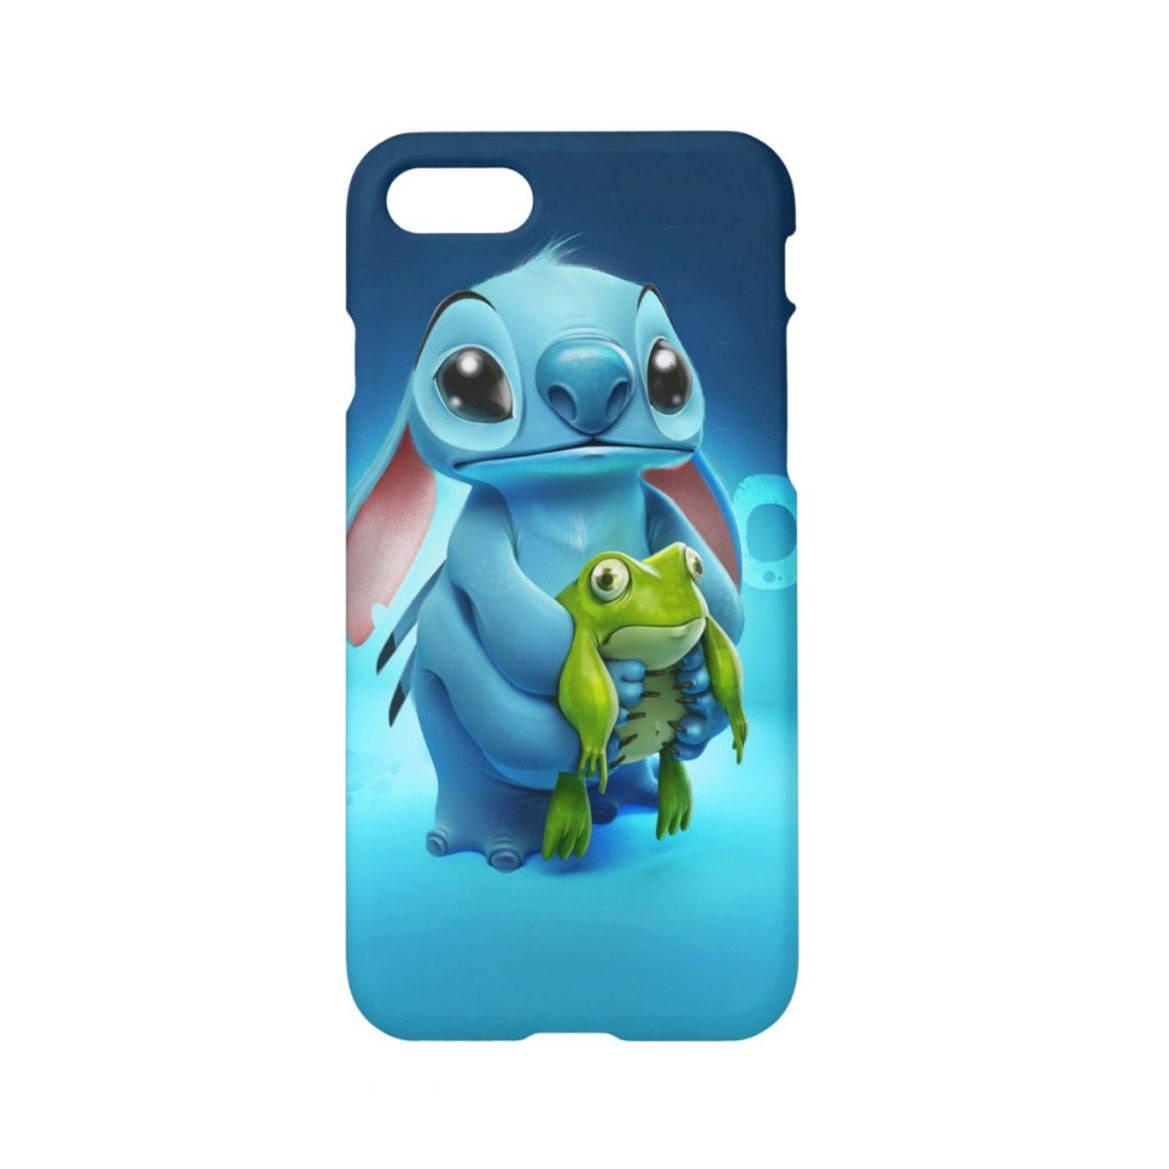 Bags Purses Dus Iphone 6 Plus Fullset Acc Stitch 7 Case 6s